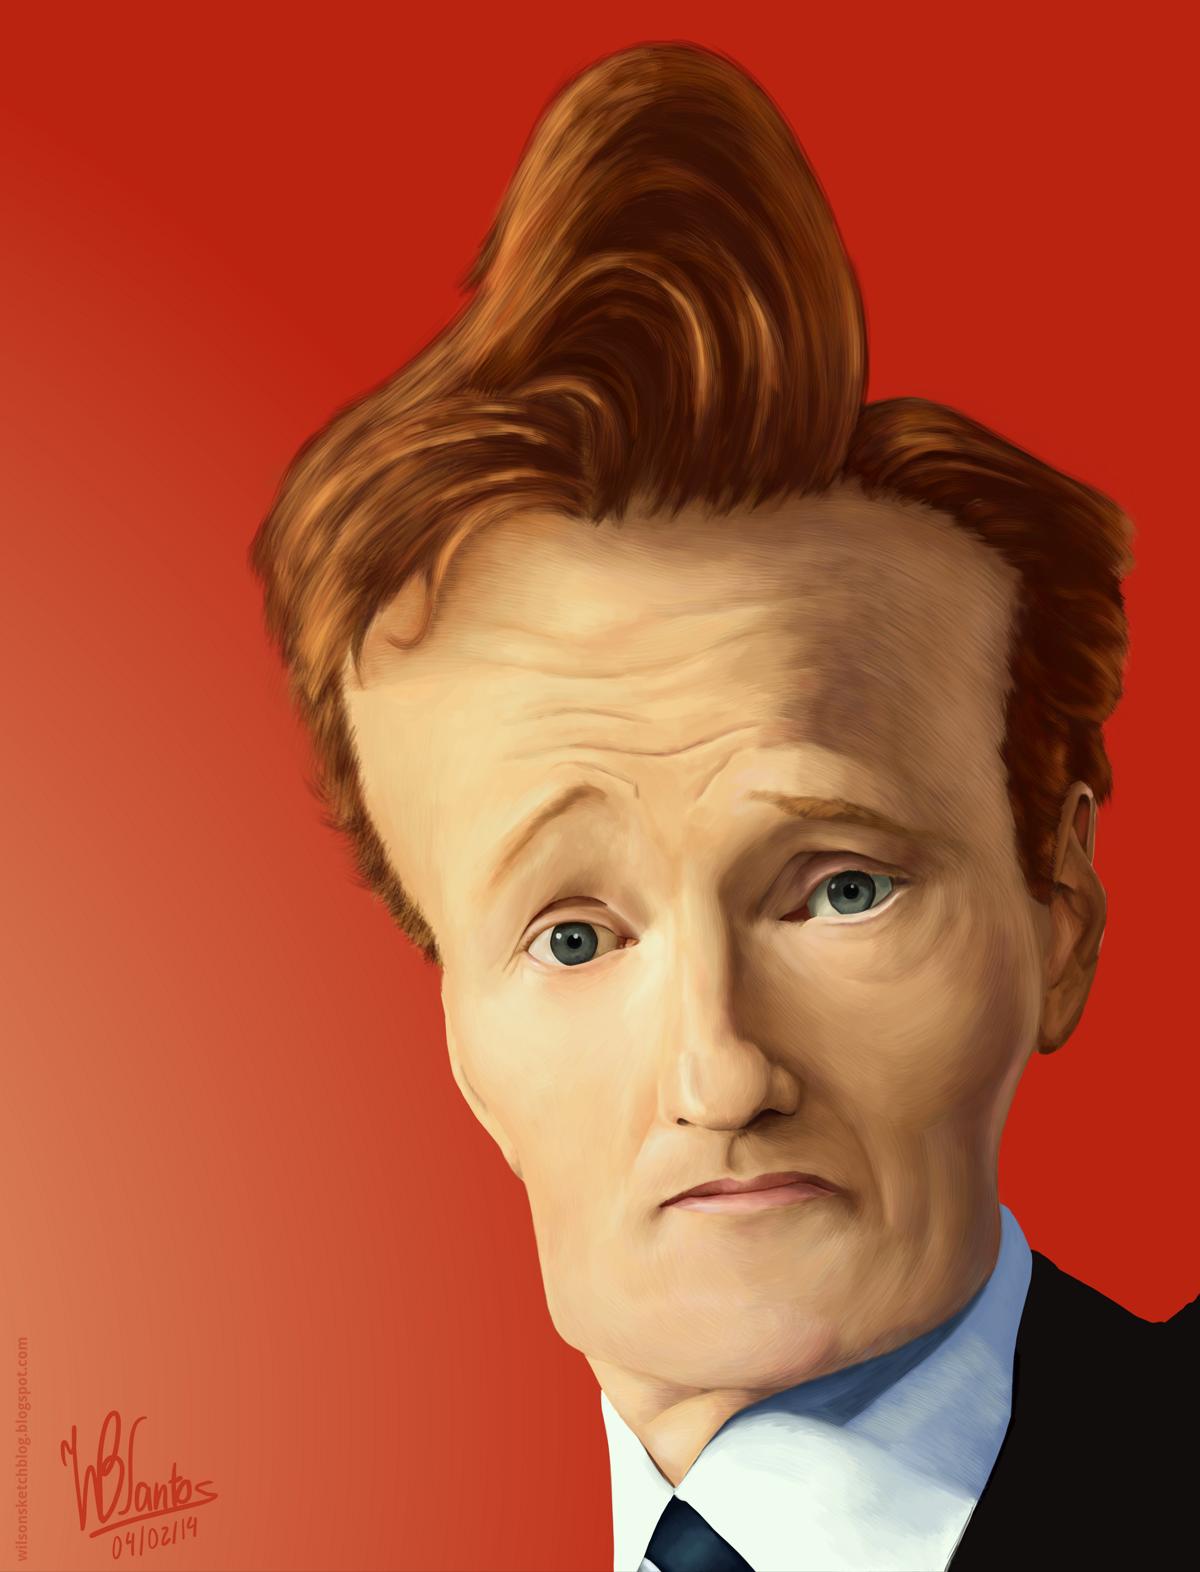 https://lh4.googleusercontent.com/-pXlZF3QSYY8/UvE0Rzd3YjI/AAAAAAAAEQ8/imwM3IBYc8I/s1600/caricature-conan-obrien-color.png